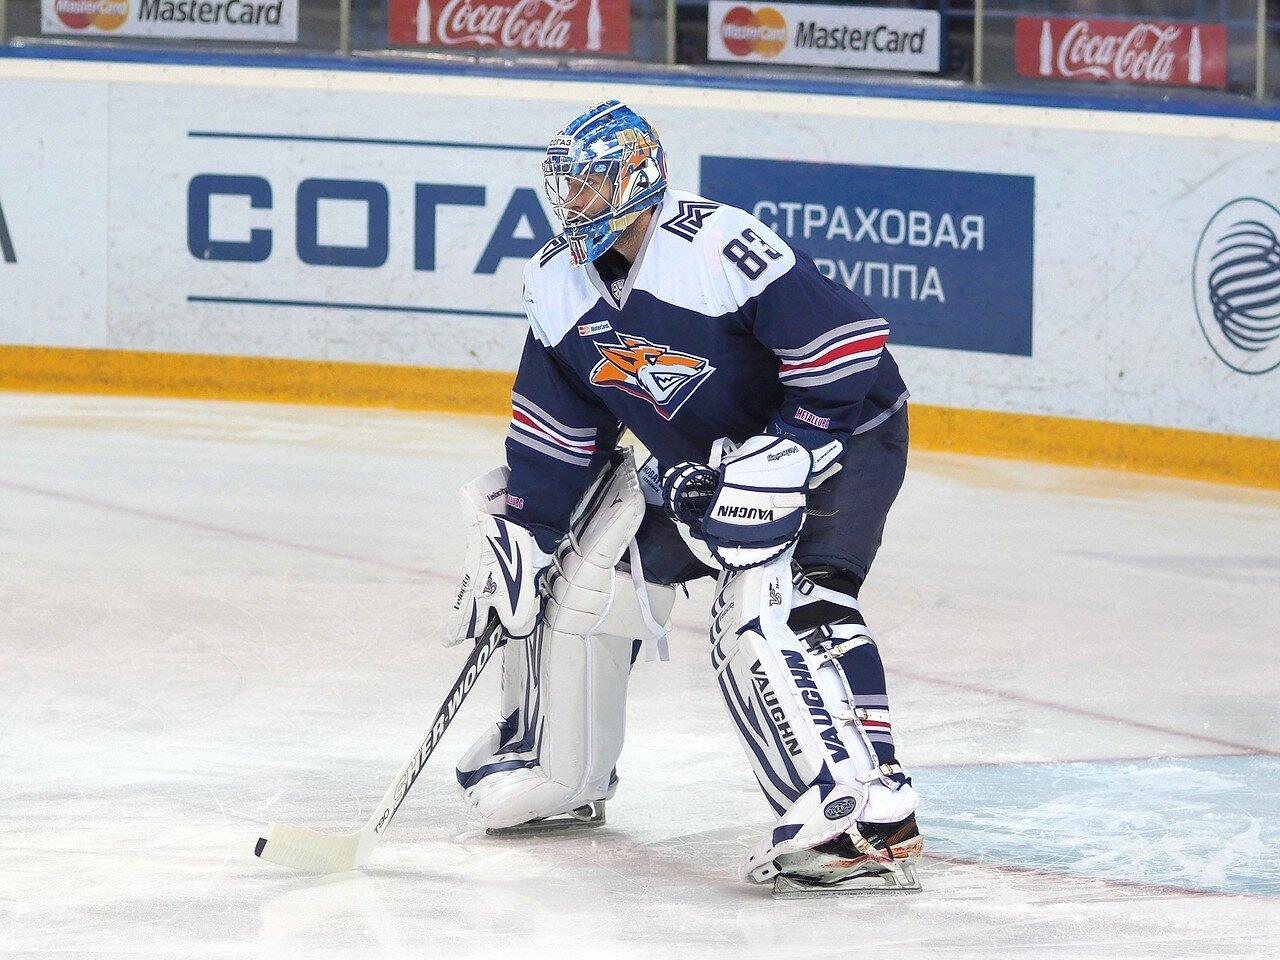 21Восток 1/2 плей-офф Металлург - Сибирь 08.03.2016